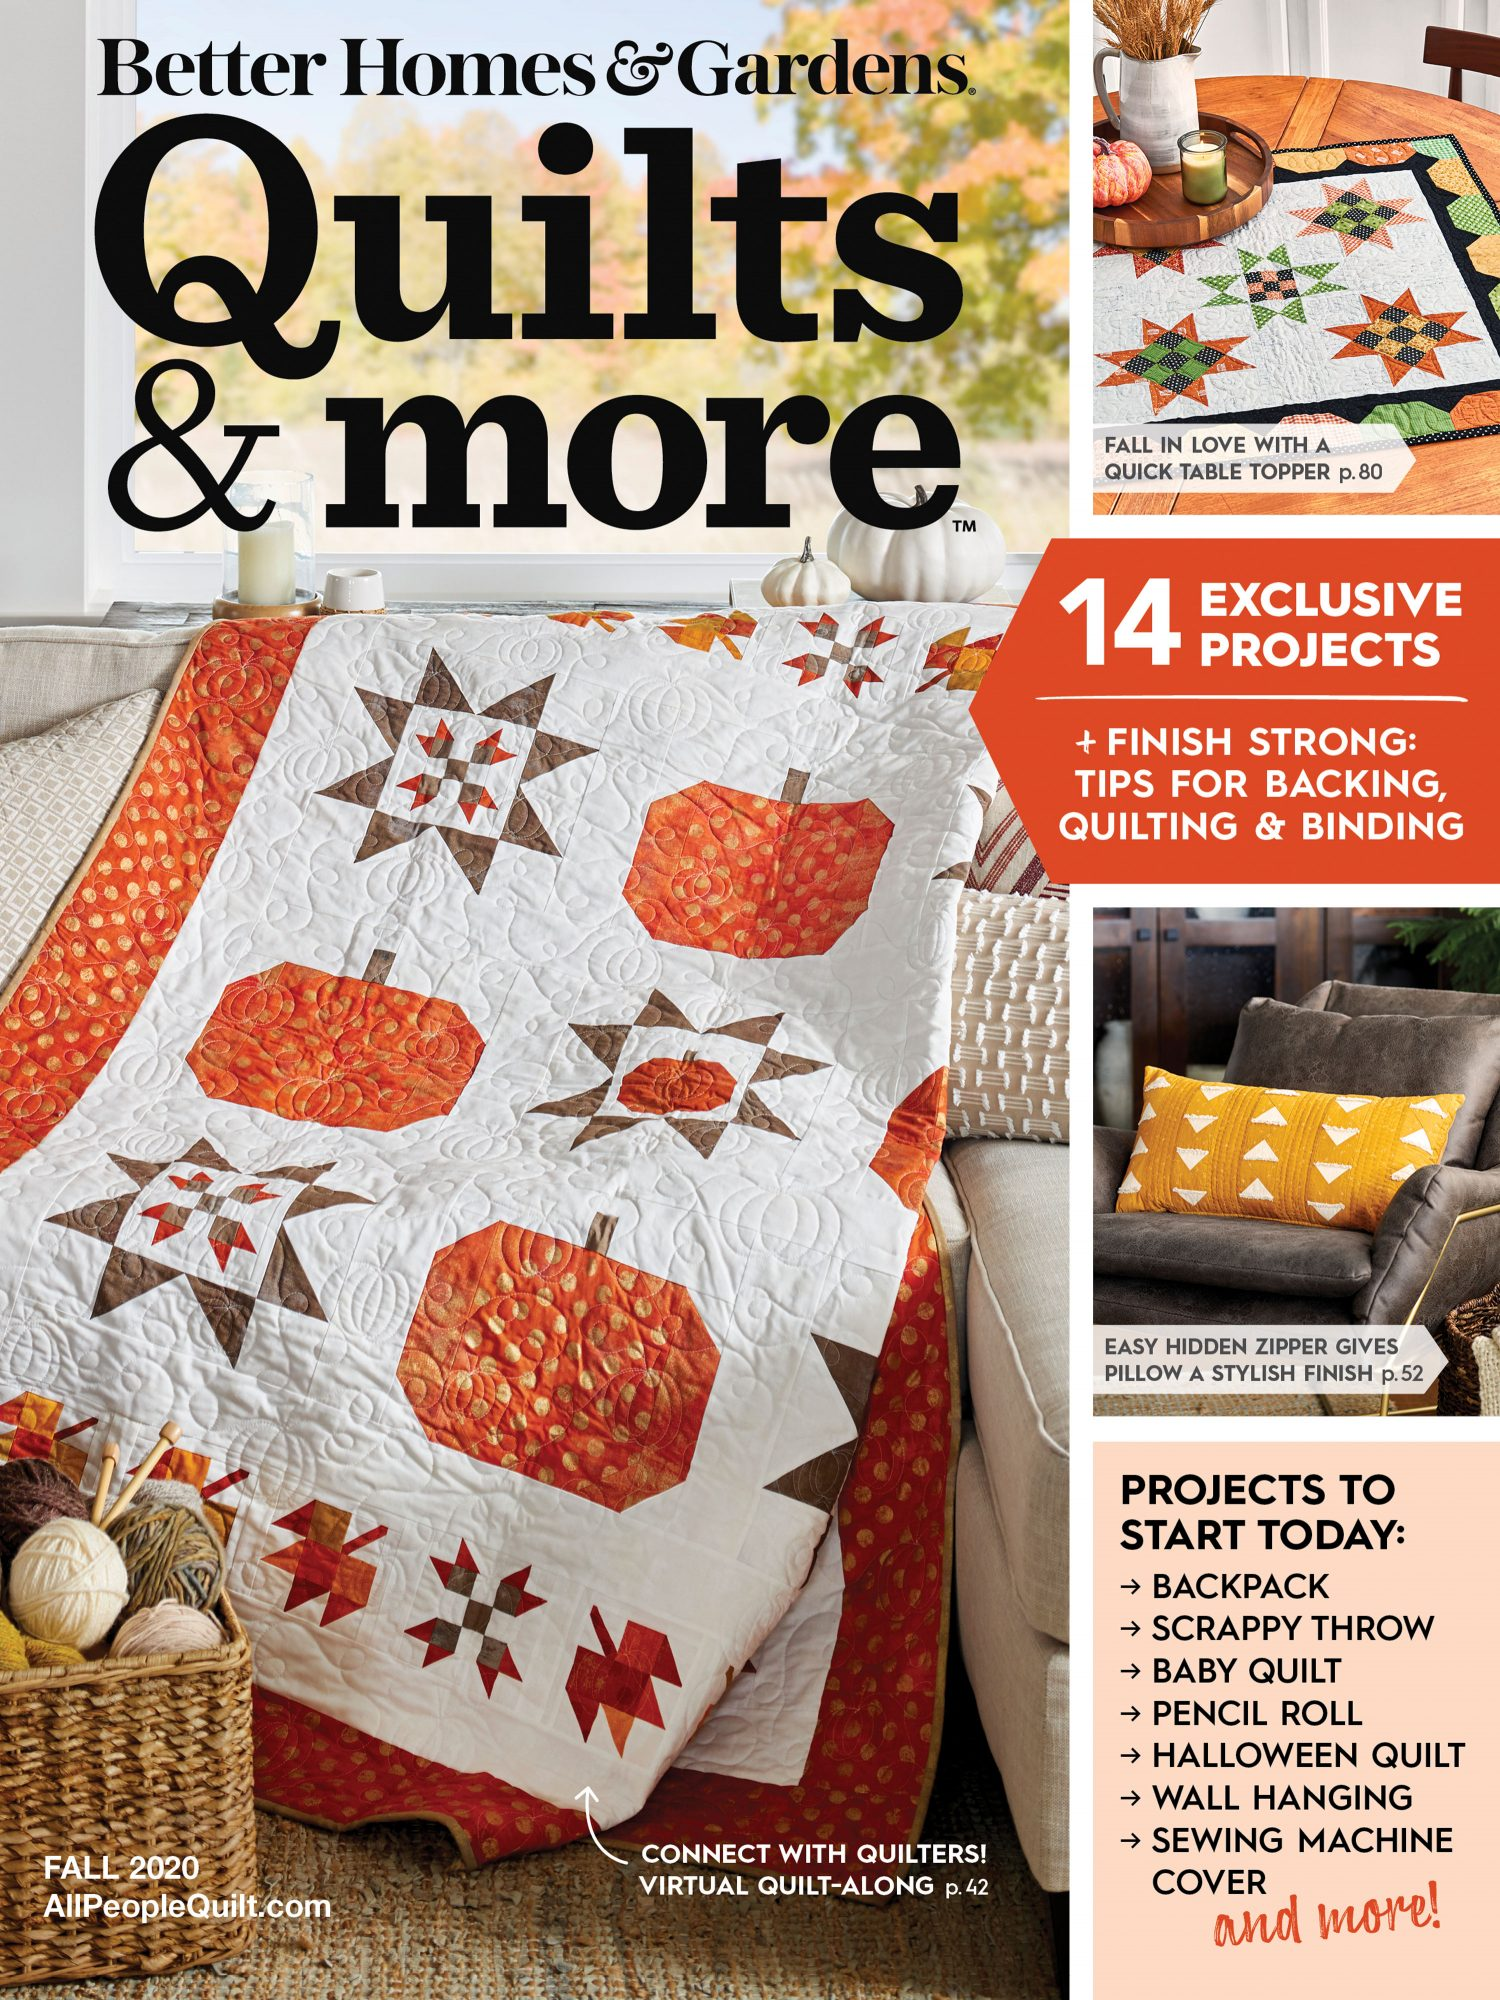 Halloween Quilts, Patterns 2020 Quilts & More Fall 2020   AllPeopleQuilt.com